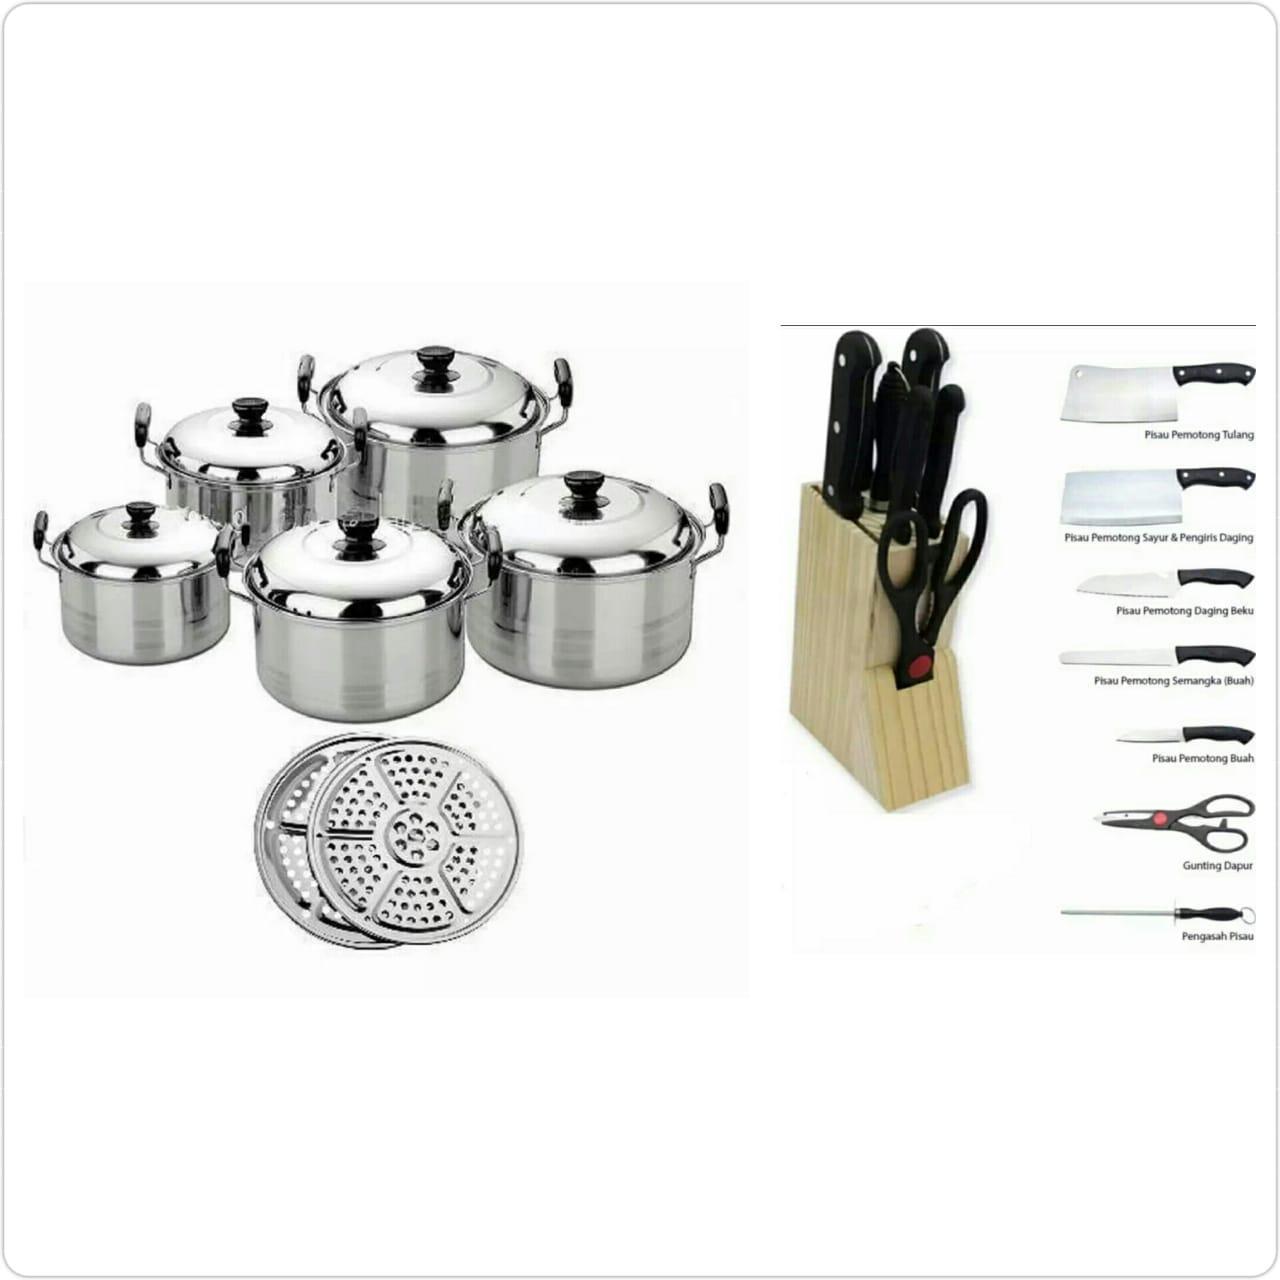 Paket Happy Life America High Pots Panci Set 5 in 1 + Kukusan dan Pisau Dapur set / Knife Set Stainless Steel - 8 Pcs Hitam